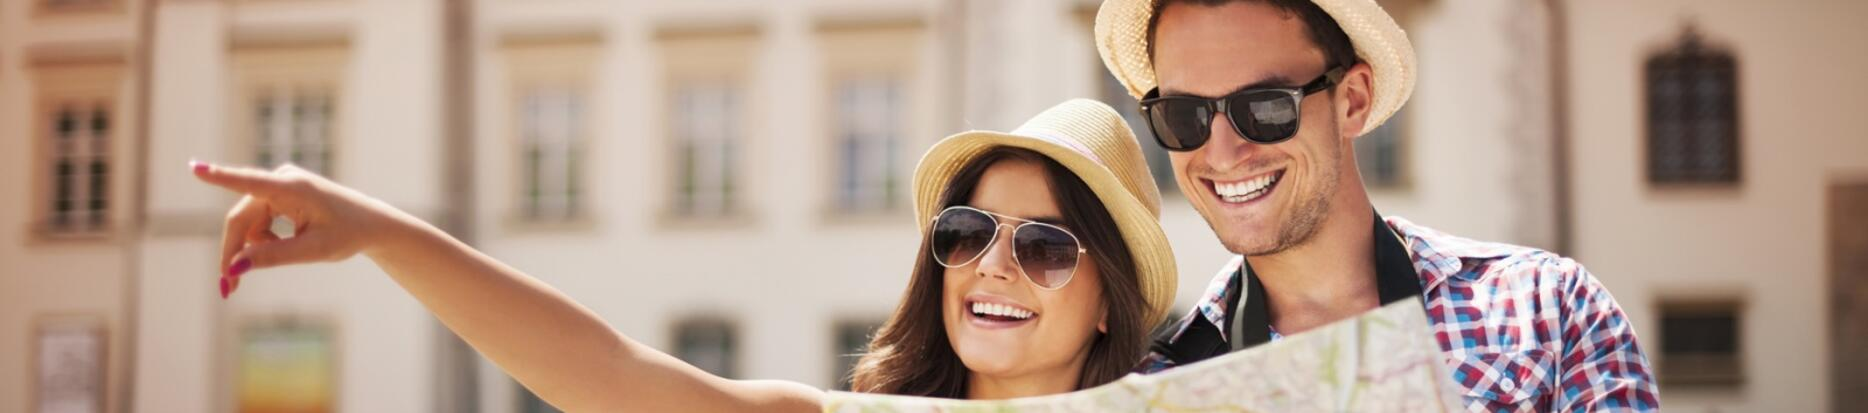 Special Wellness und Besuch in San Marino im 4-Sterne-Hotel in Rimini